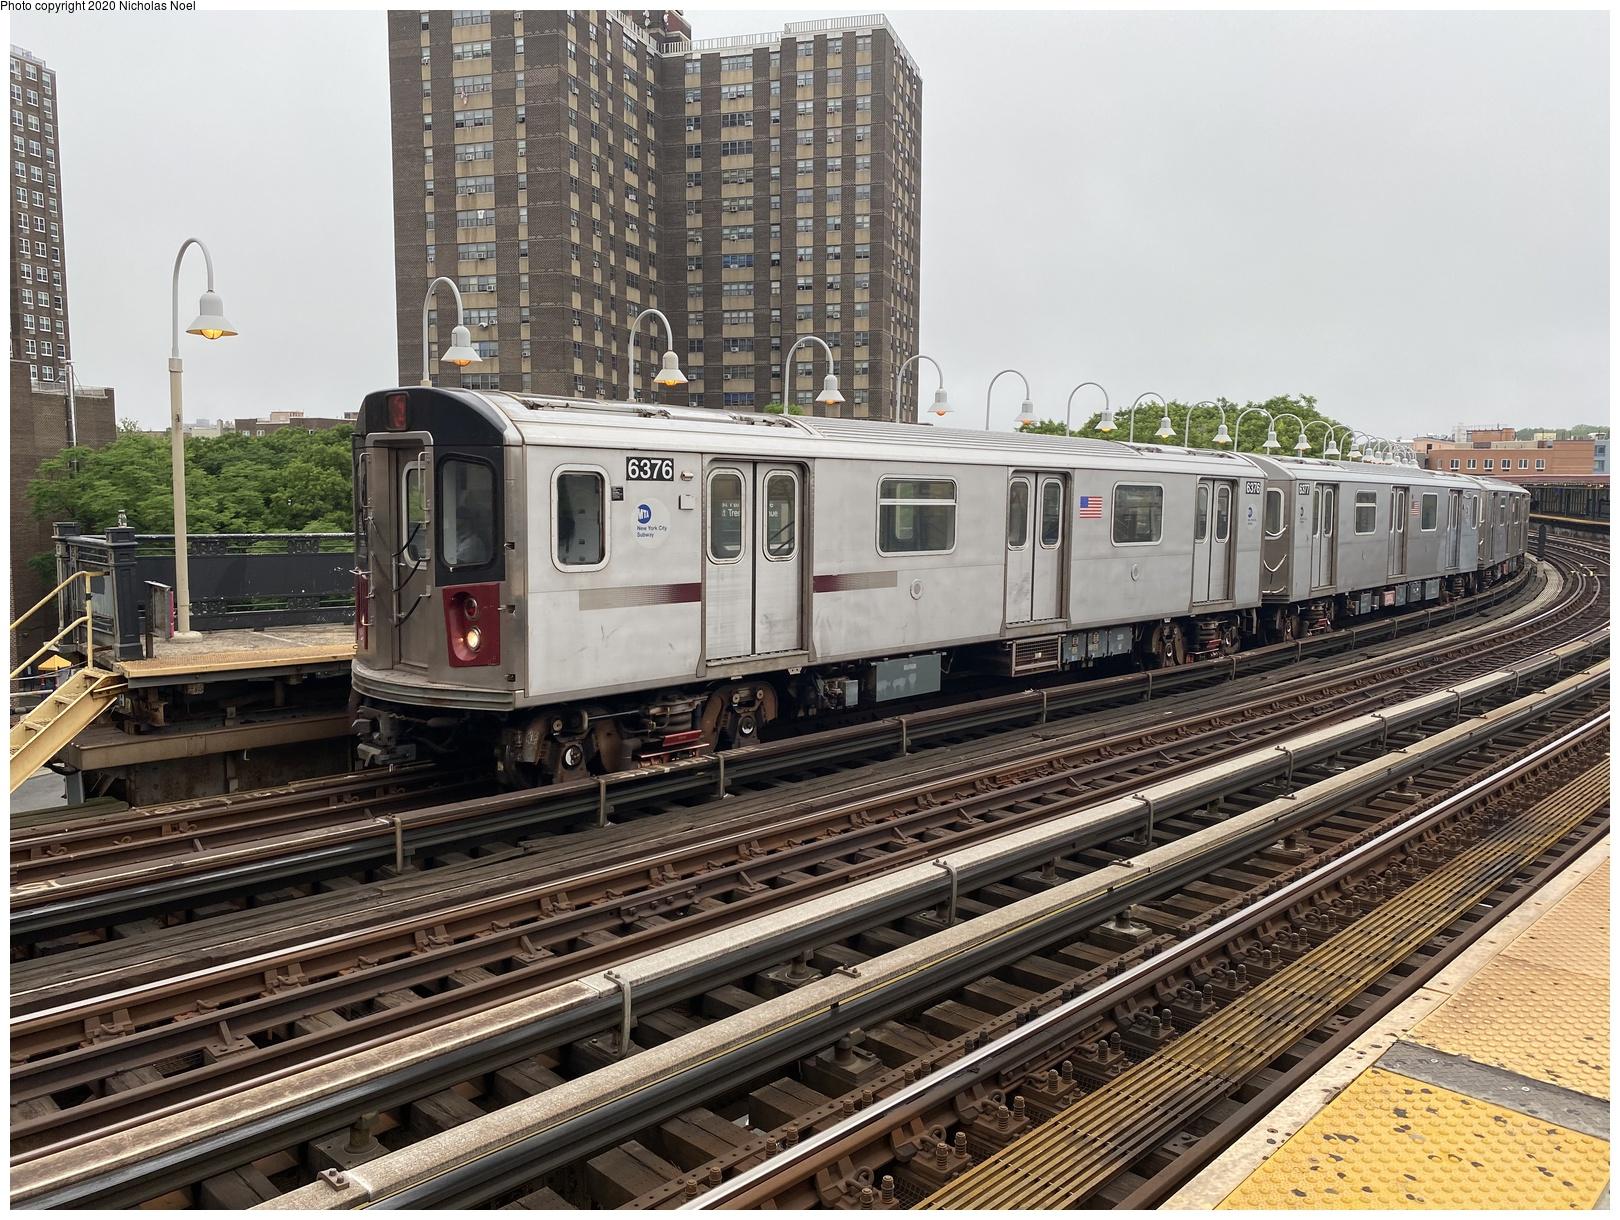 (188k, 1044x727)<br><b>Country:</b> United States<br><b>City:</b> New York<br><b>System:</b> New York City Transit<br><b>Line:</b> BMT West End Line<br><b>Location:</b> Bay 50th Street <br><b>Car:</b> BMT D-Type Triplex 6077 <br><b>Photo by:</b> Joel Shanus<br><b>Viewed (this week/total):</b> 0 / 2515